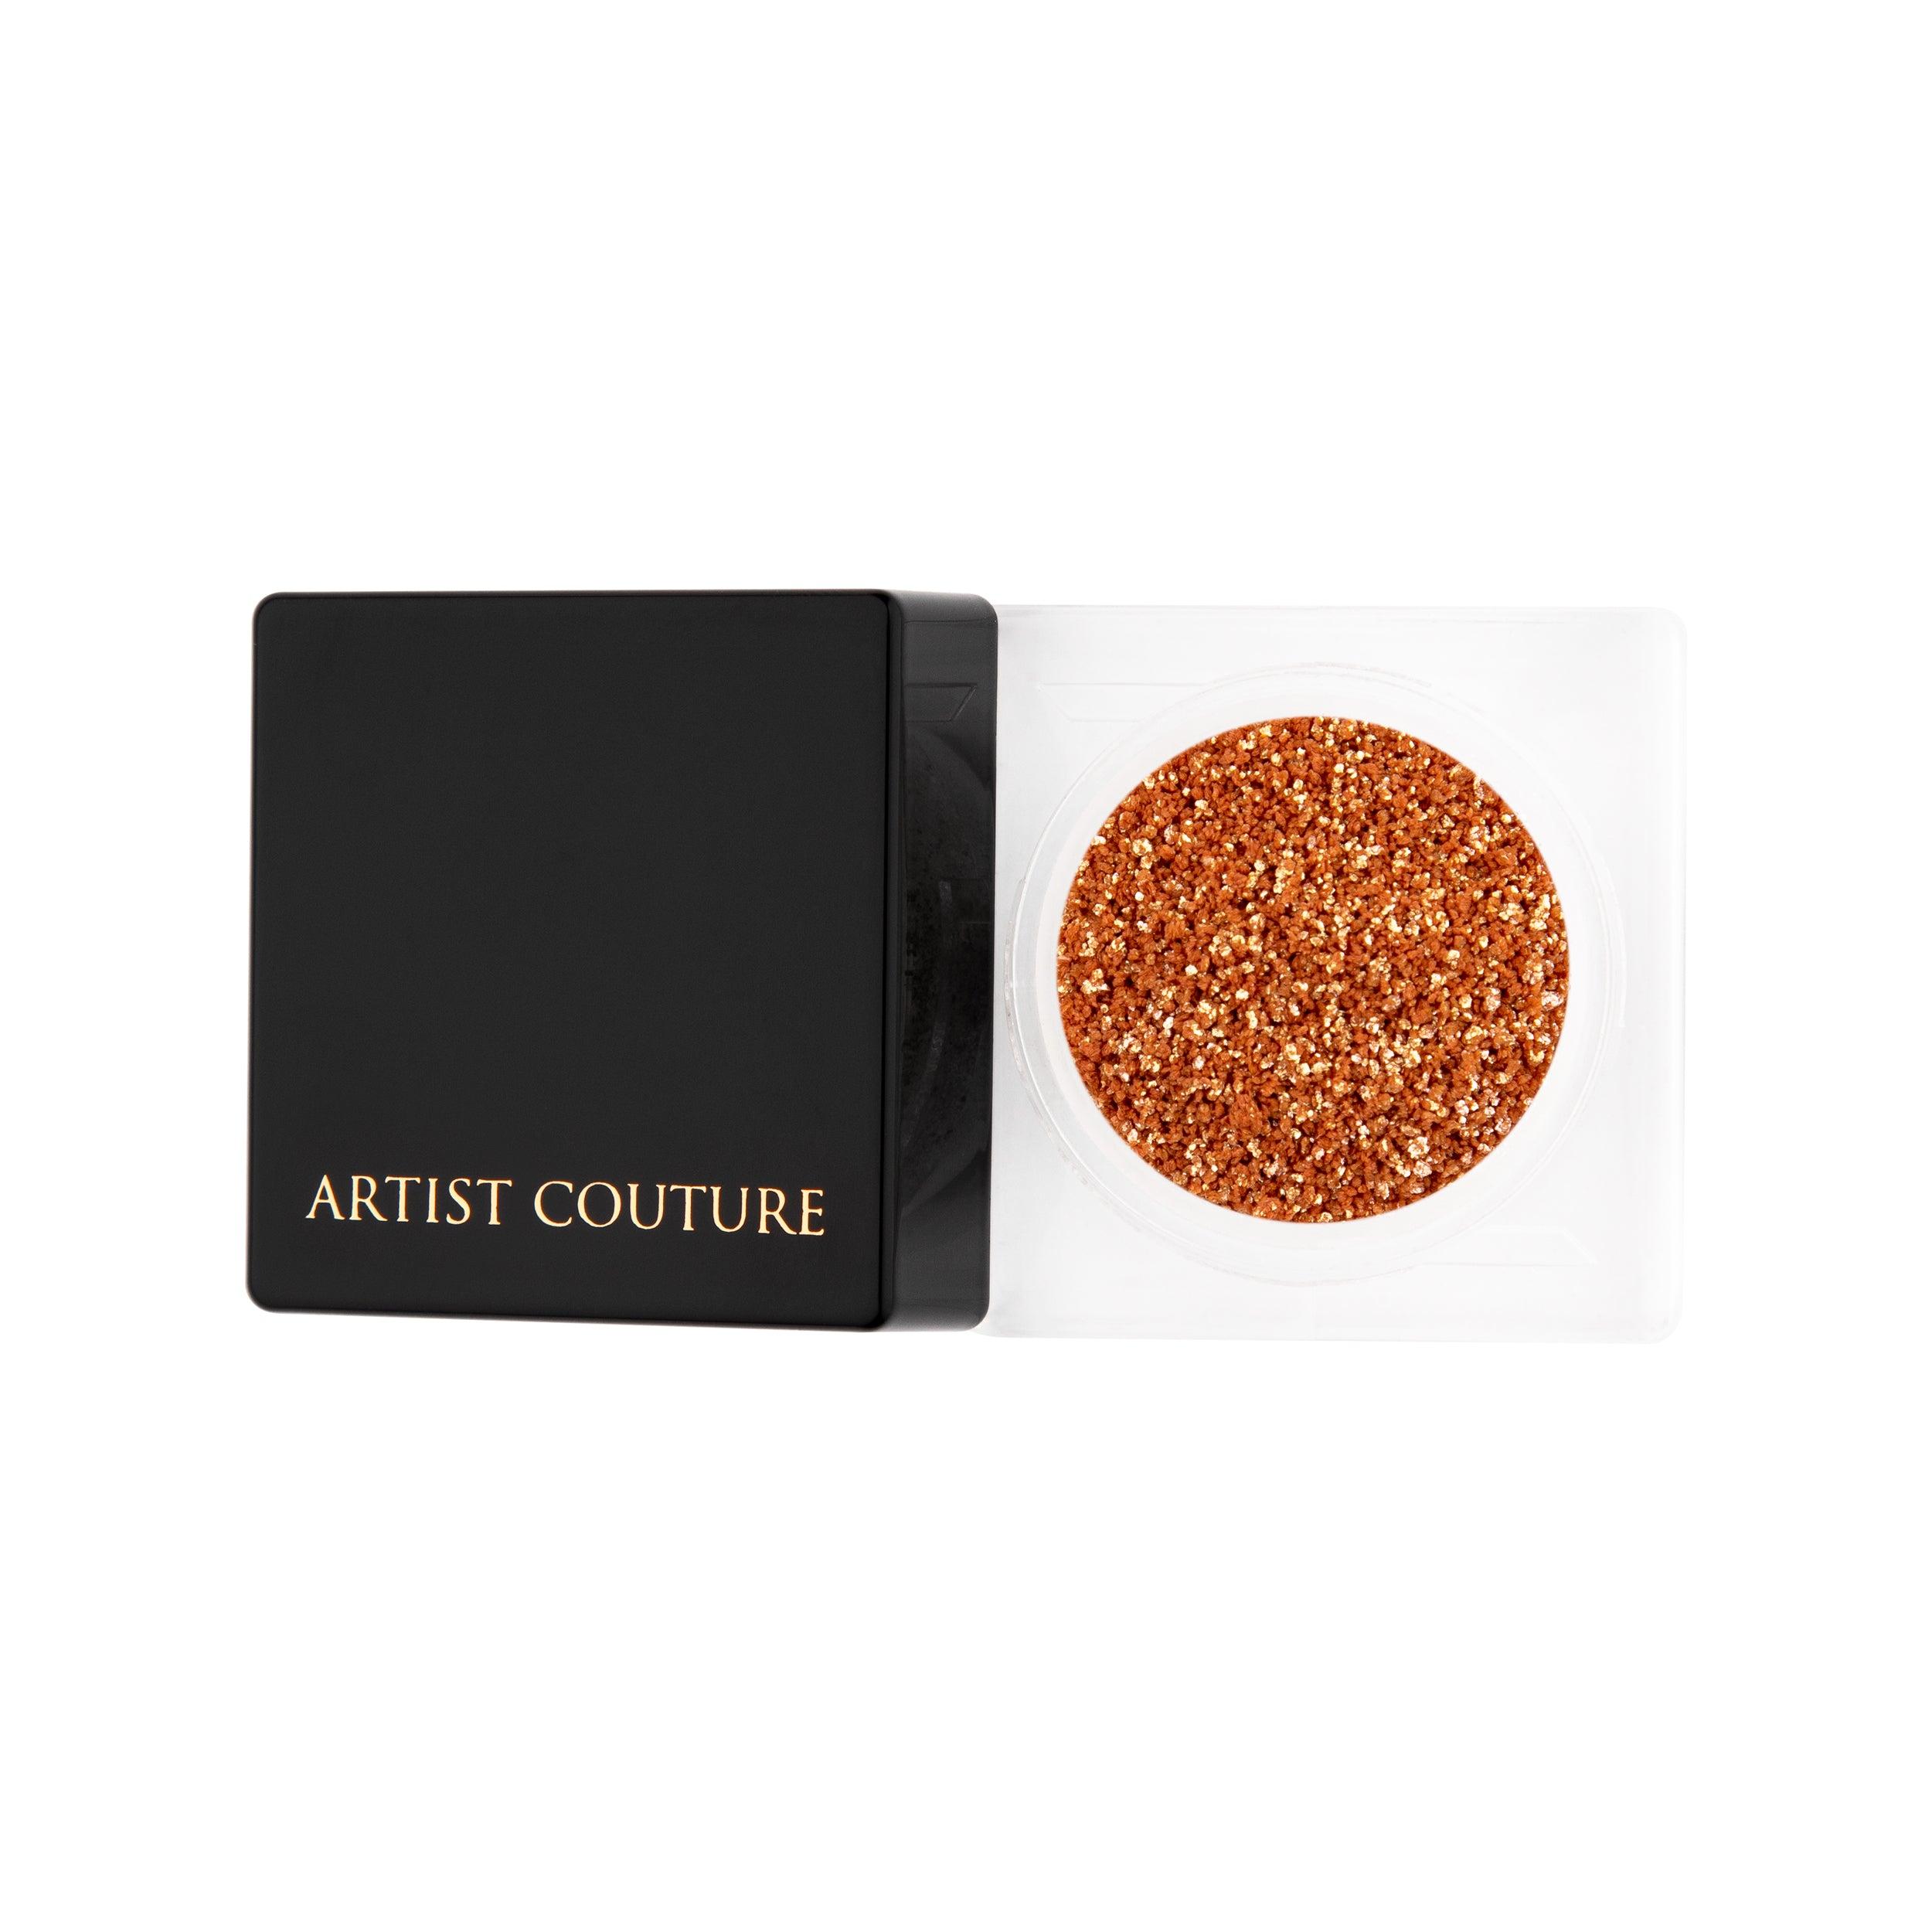 Artist Couture - Spotlight Glitz